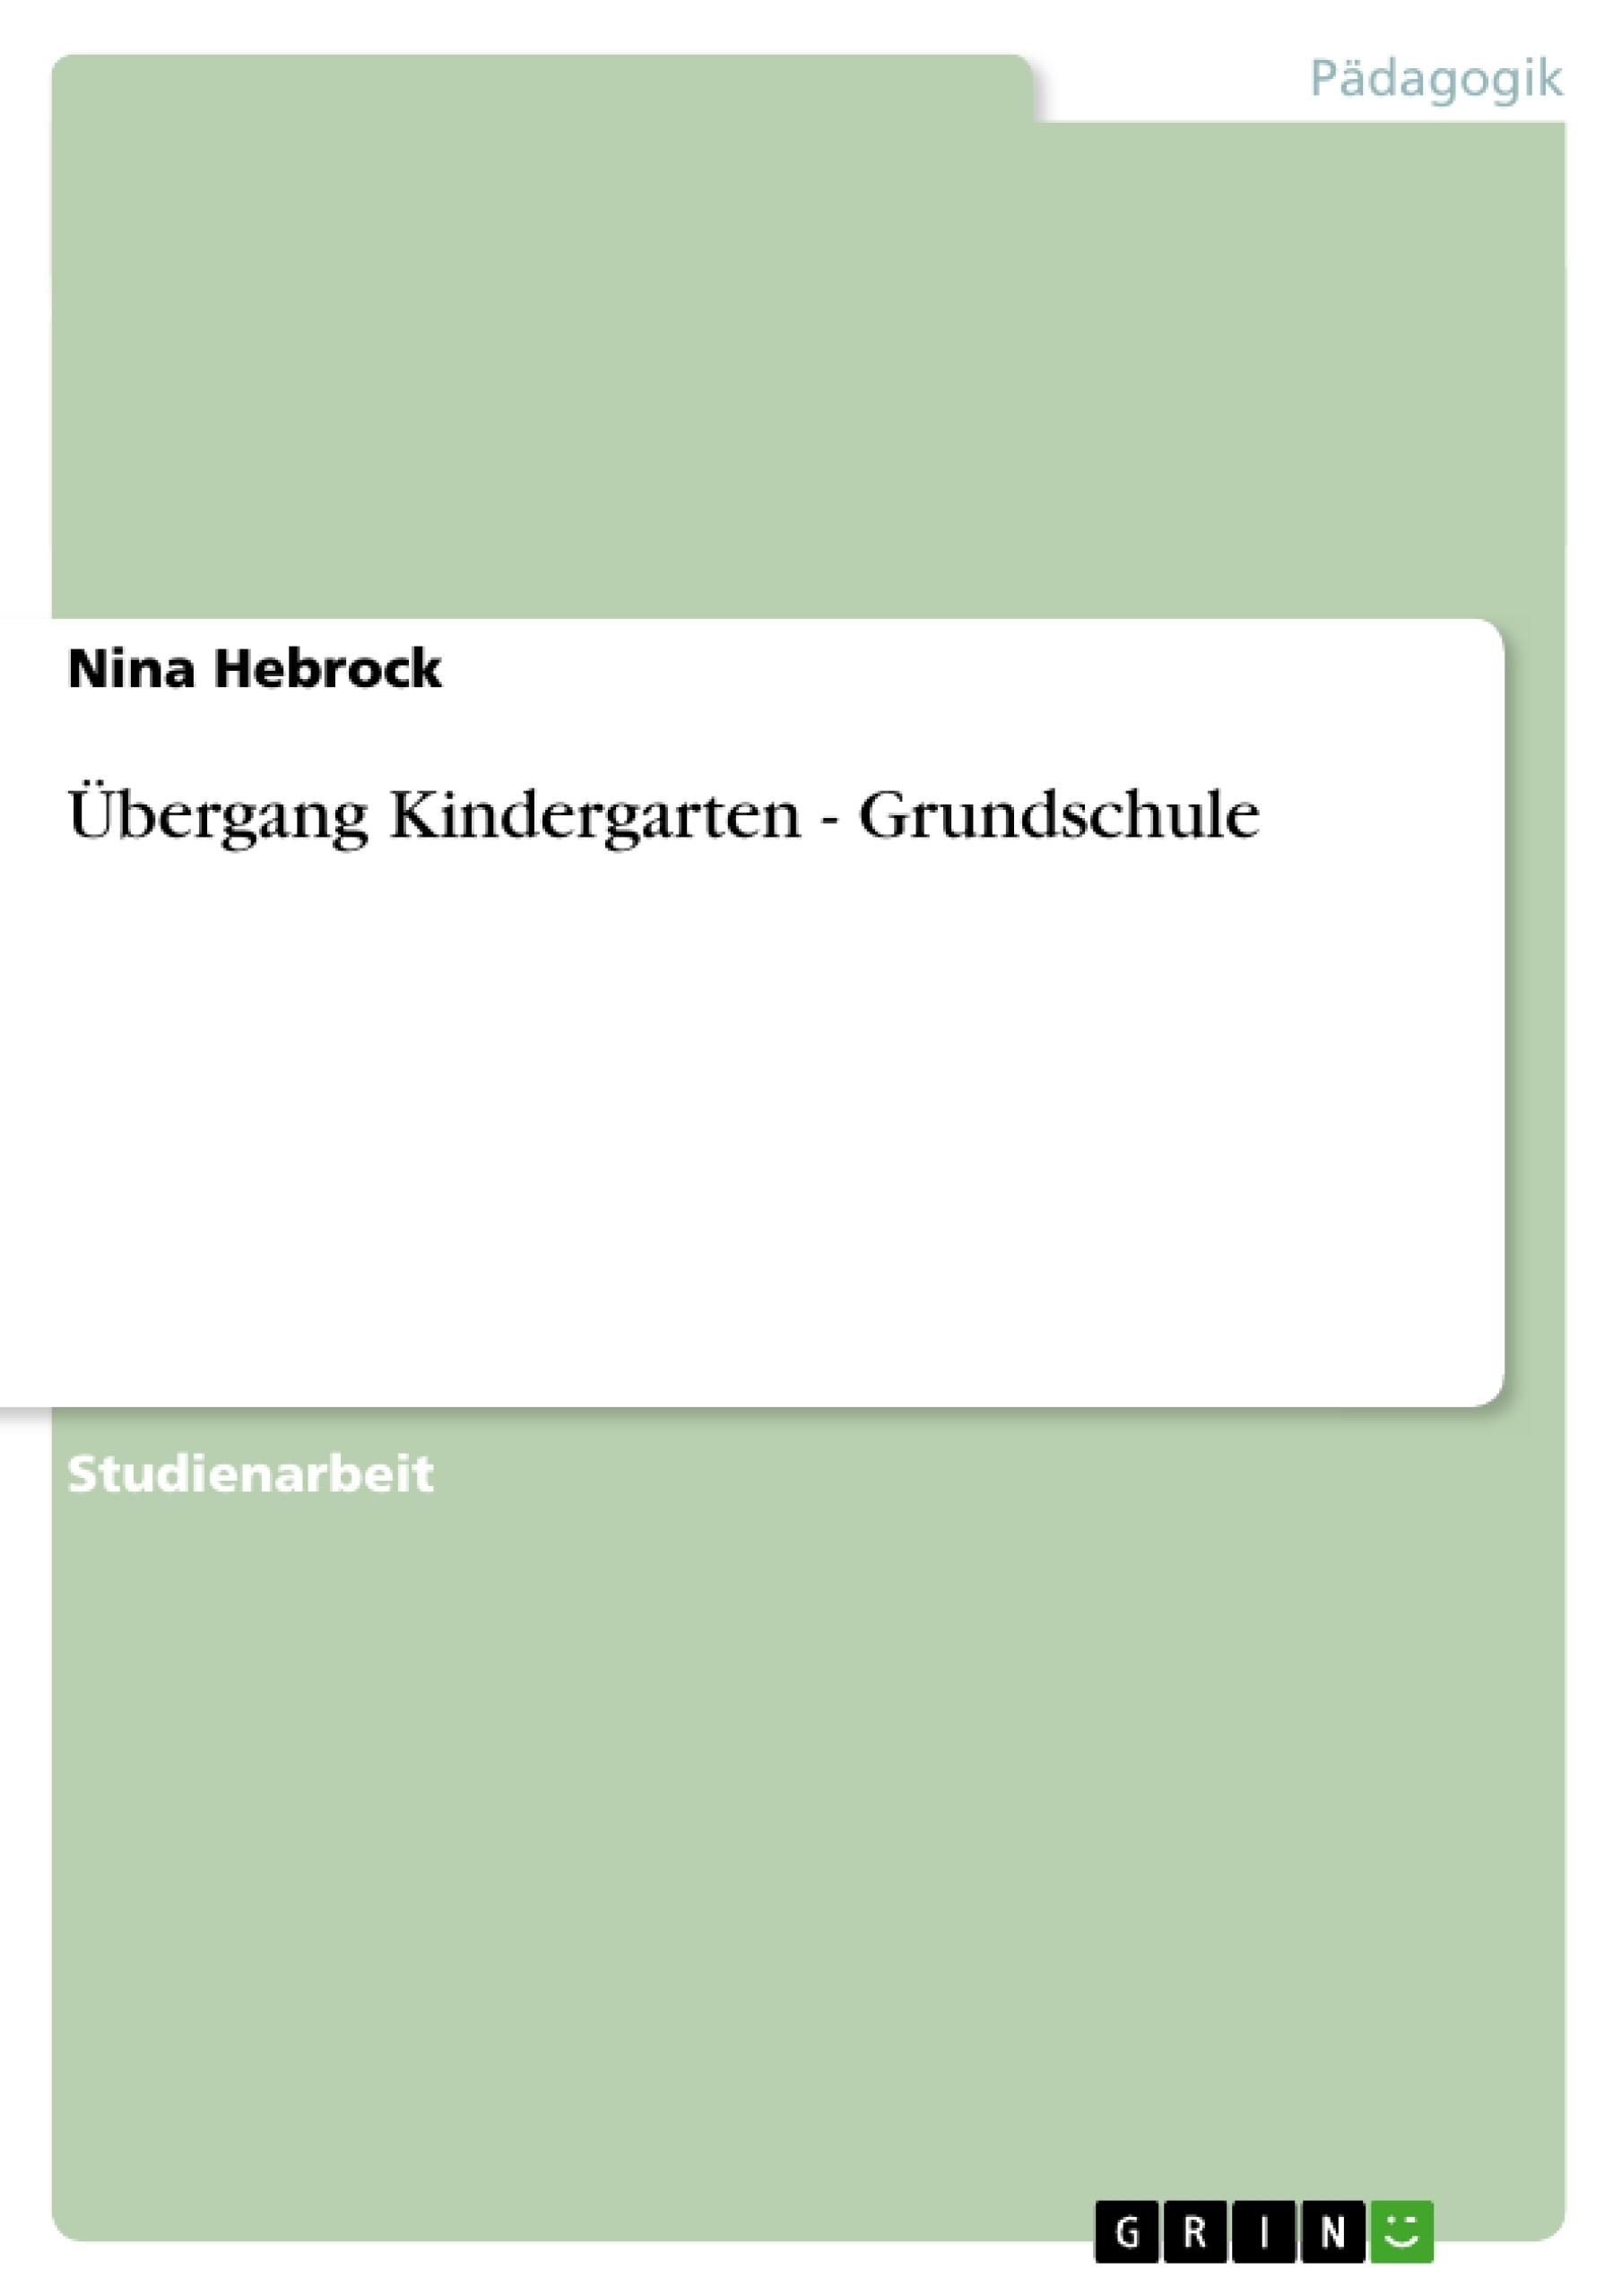 Titel: Übergang Kindergarten - Grundschule